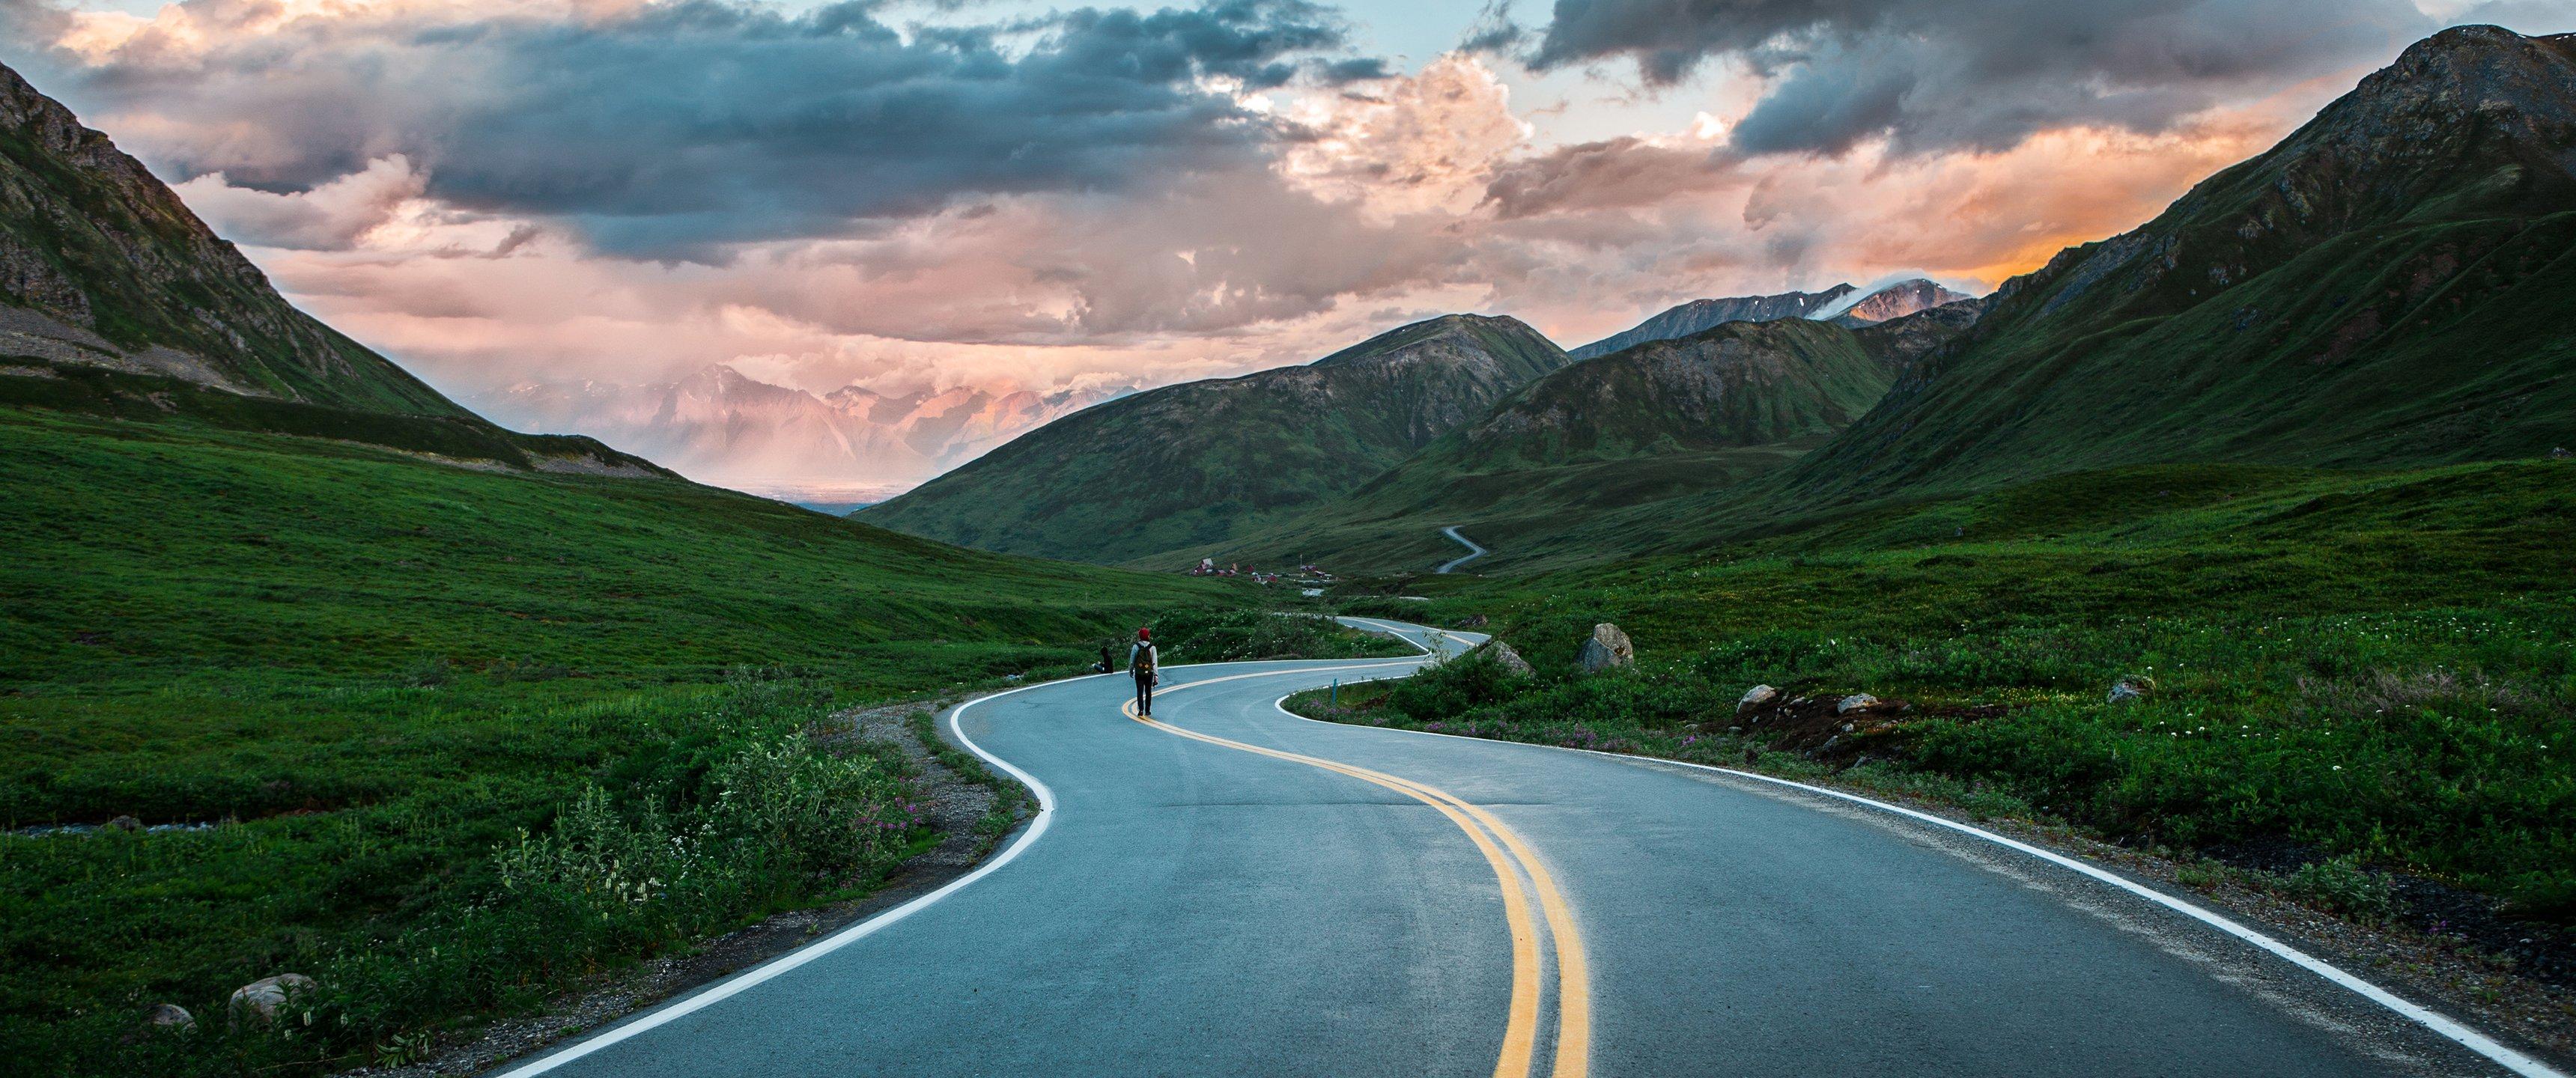 21 landscape wallpapers - photo #12